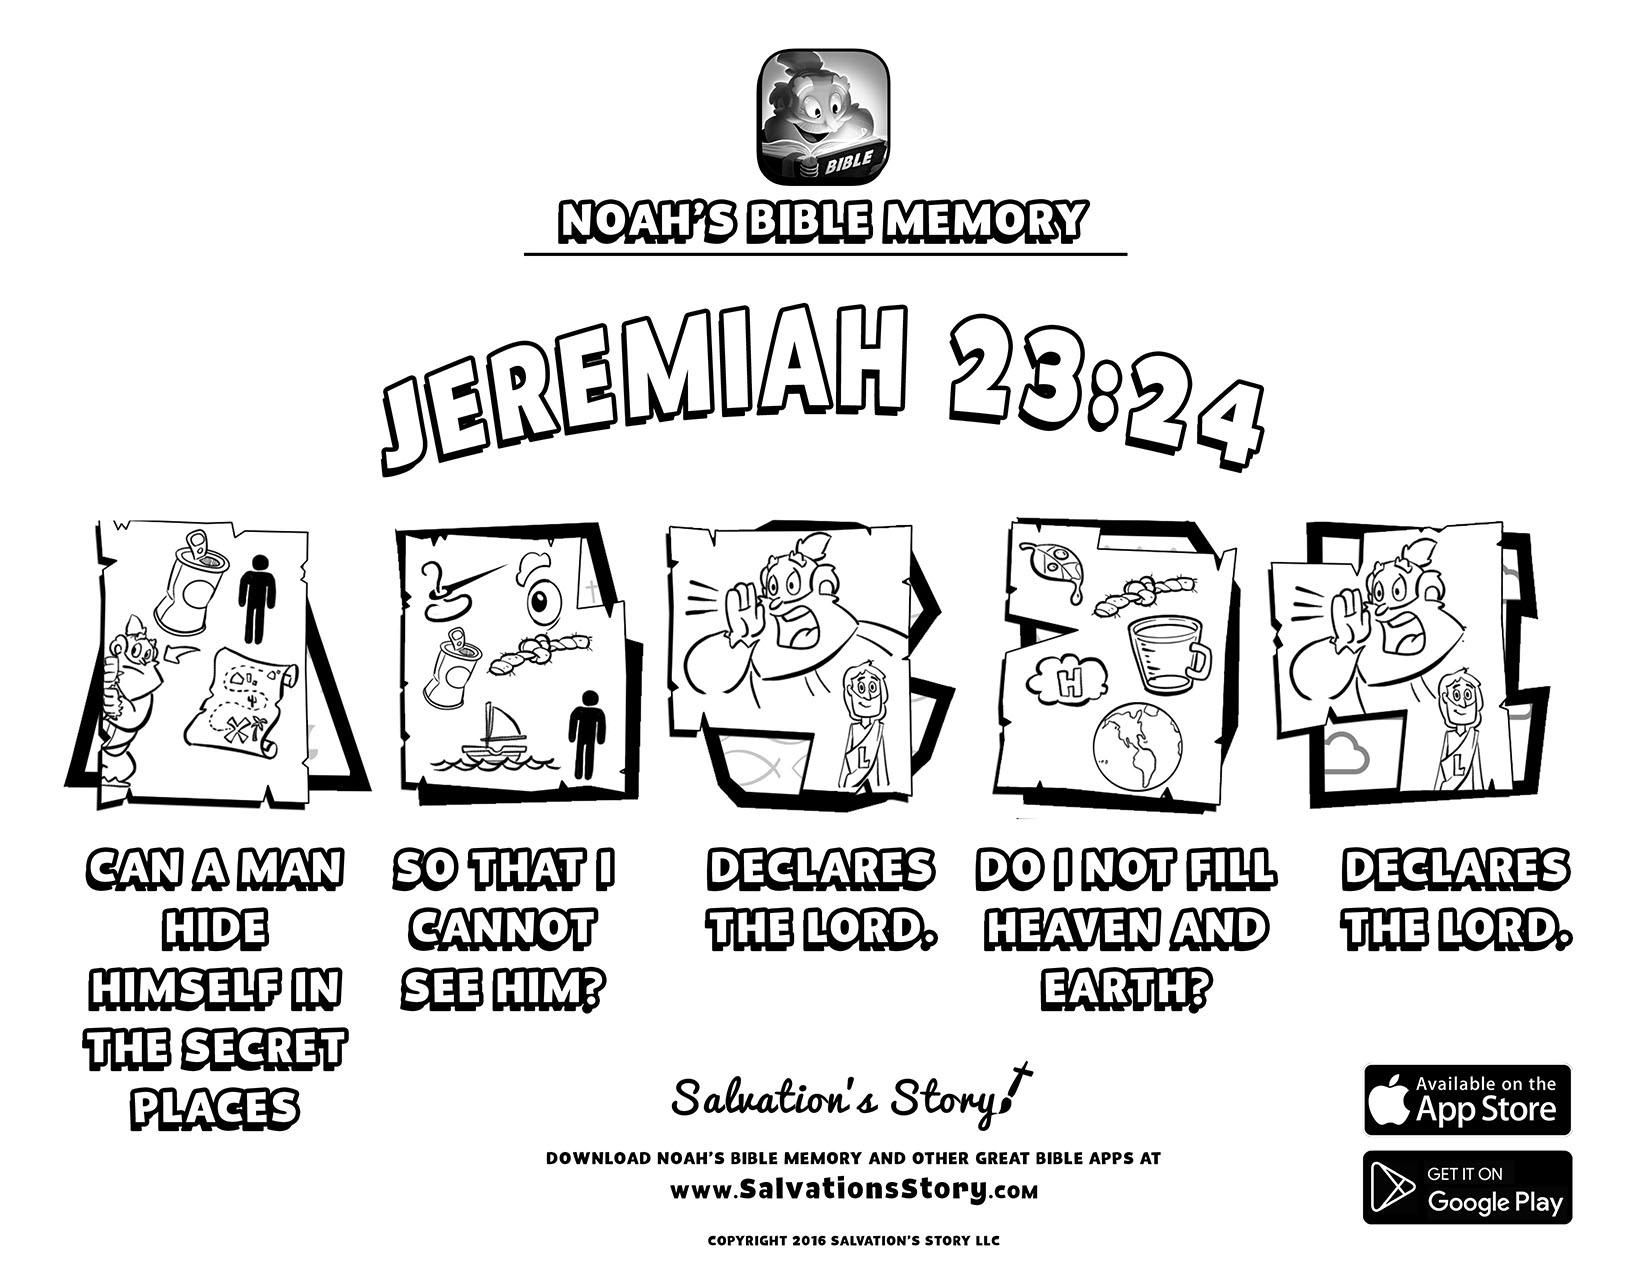 Salvations Story - Bible Memory  Jeremiah 23-24.jpg